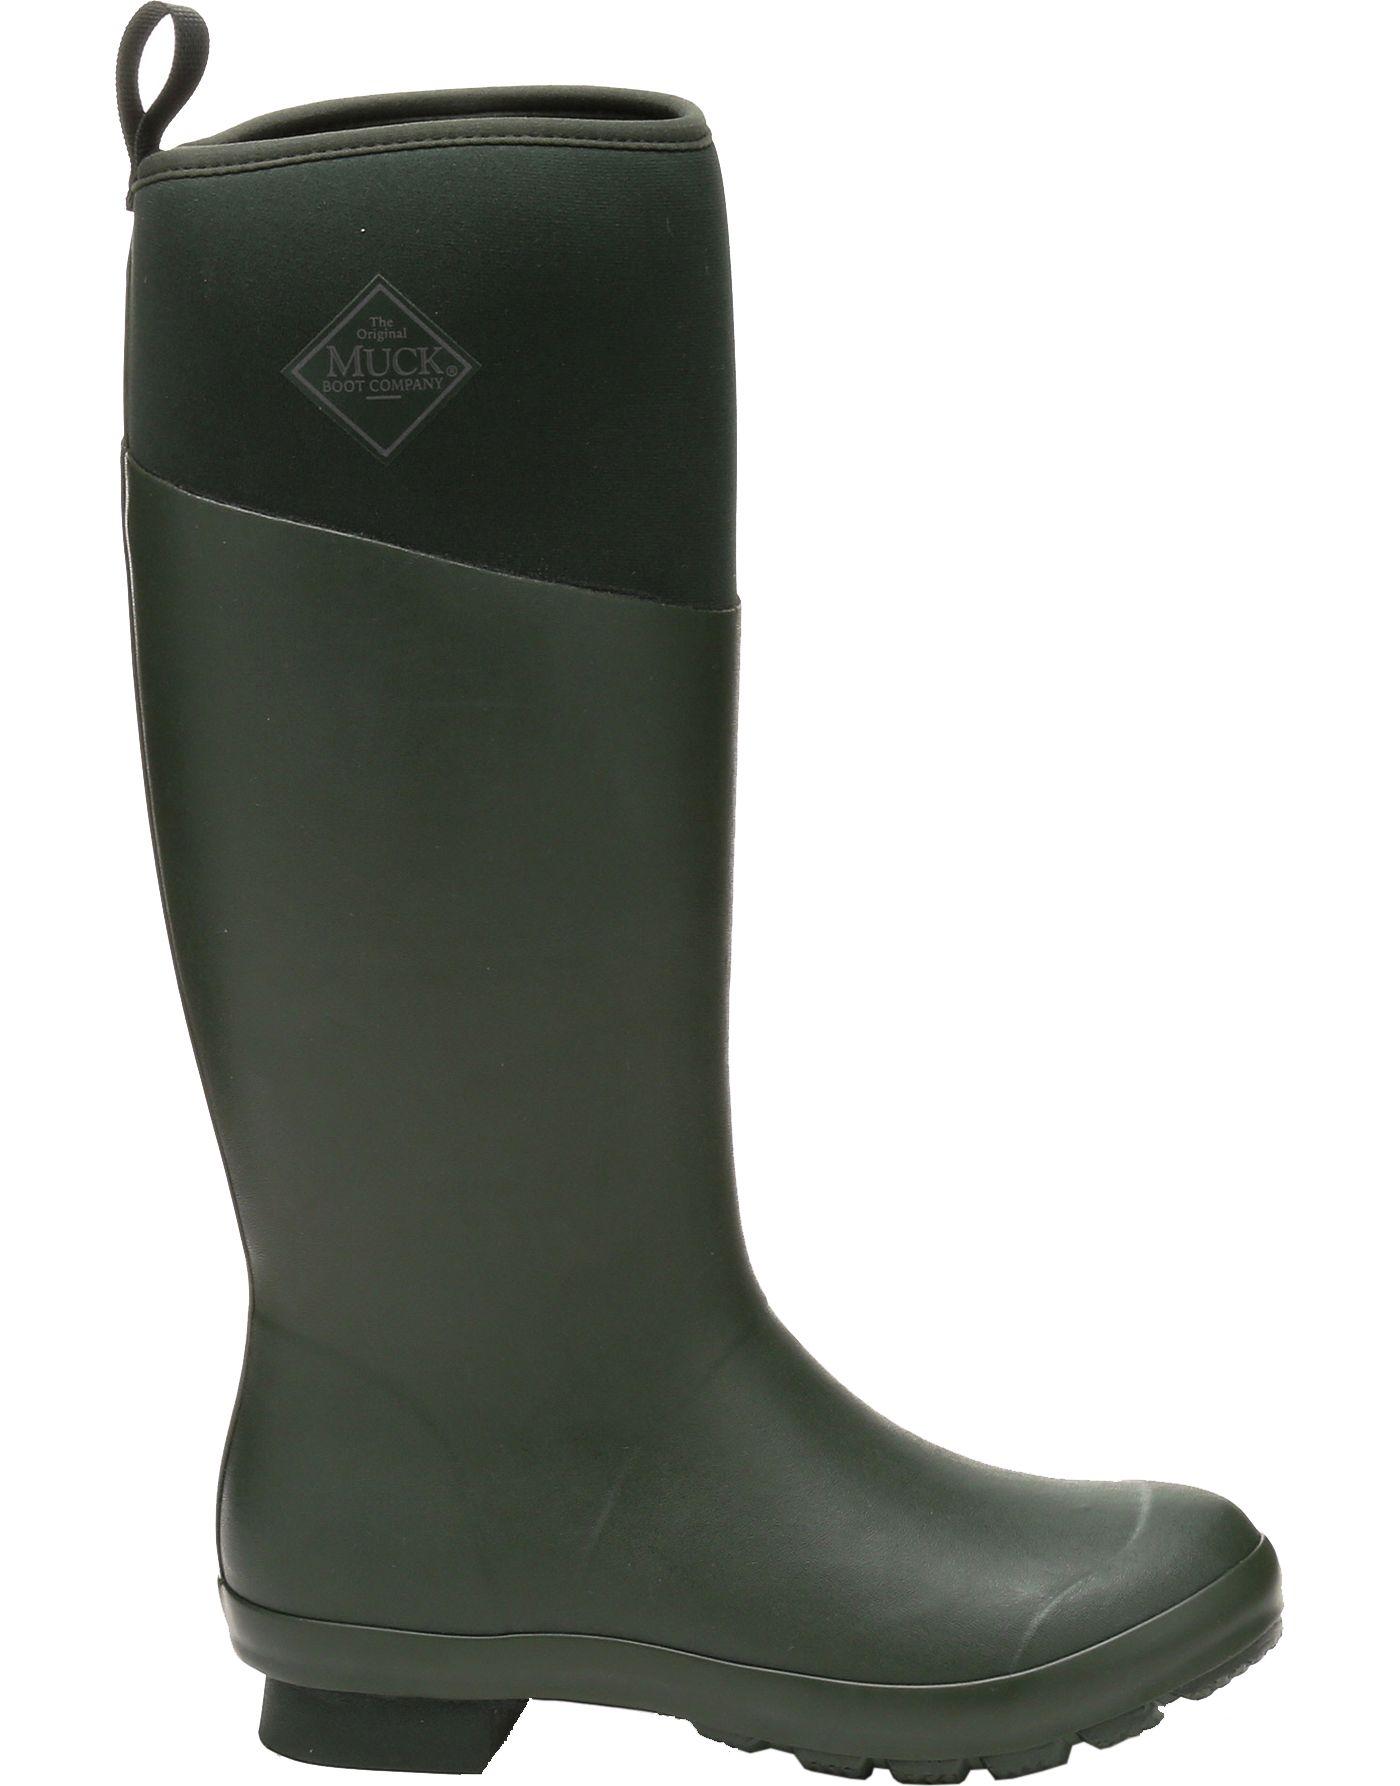 Muck Boots Women's Tremont Tall Winter Boots